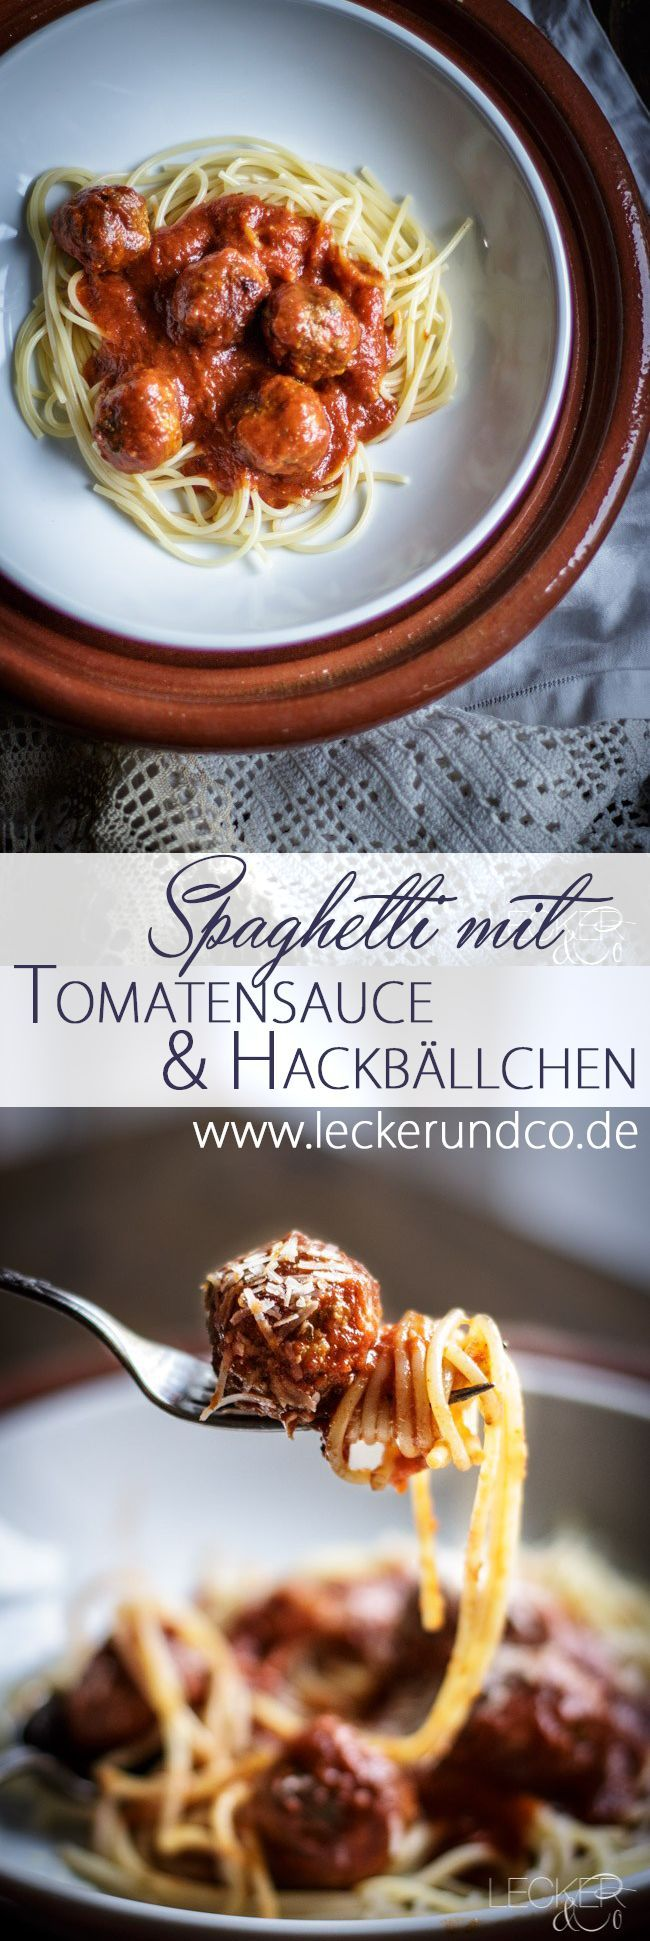 Spaghetti mit Tomatensauce und Hackbällchen | LECKER&Co | Foodblog aus Nürnberg